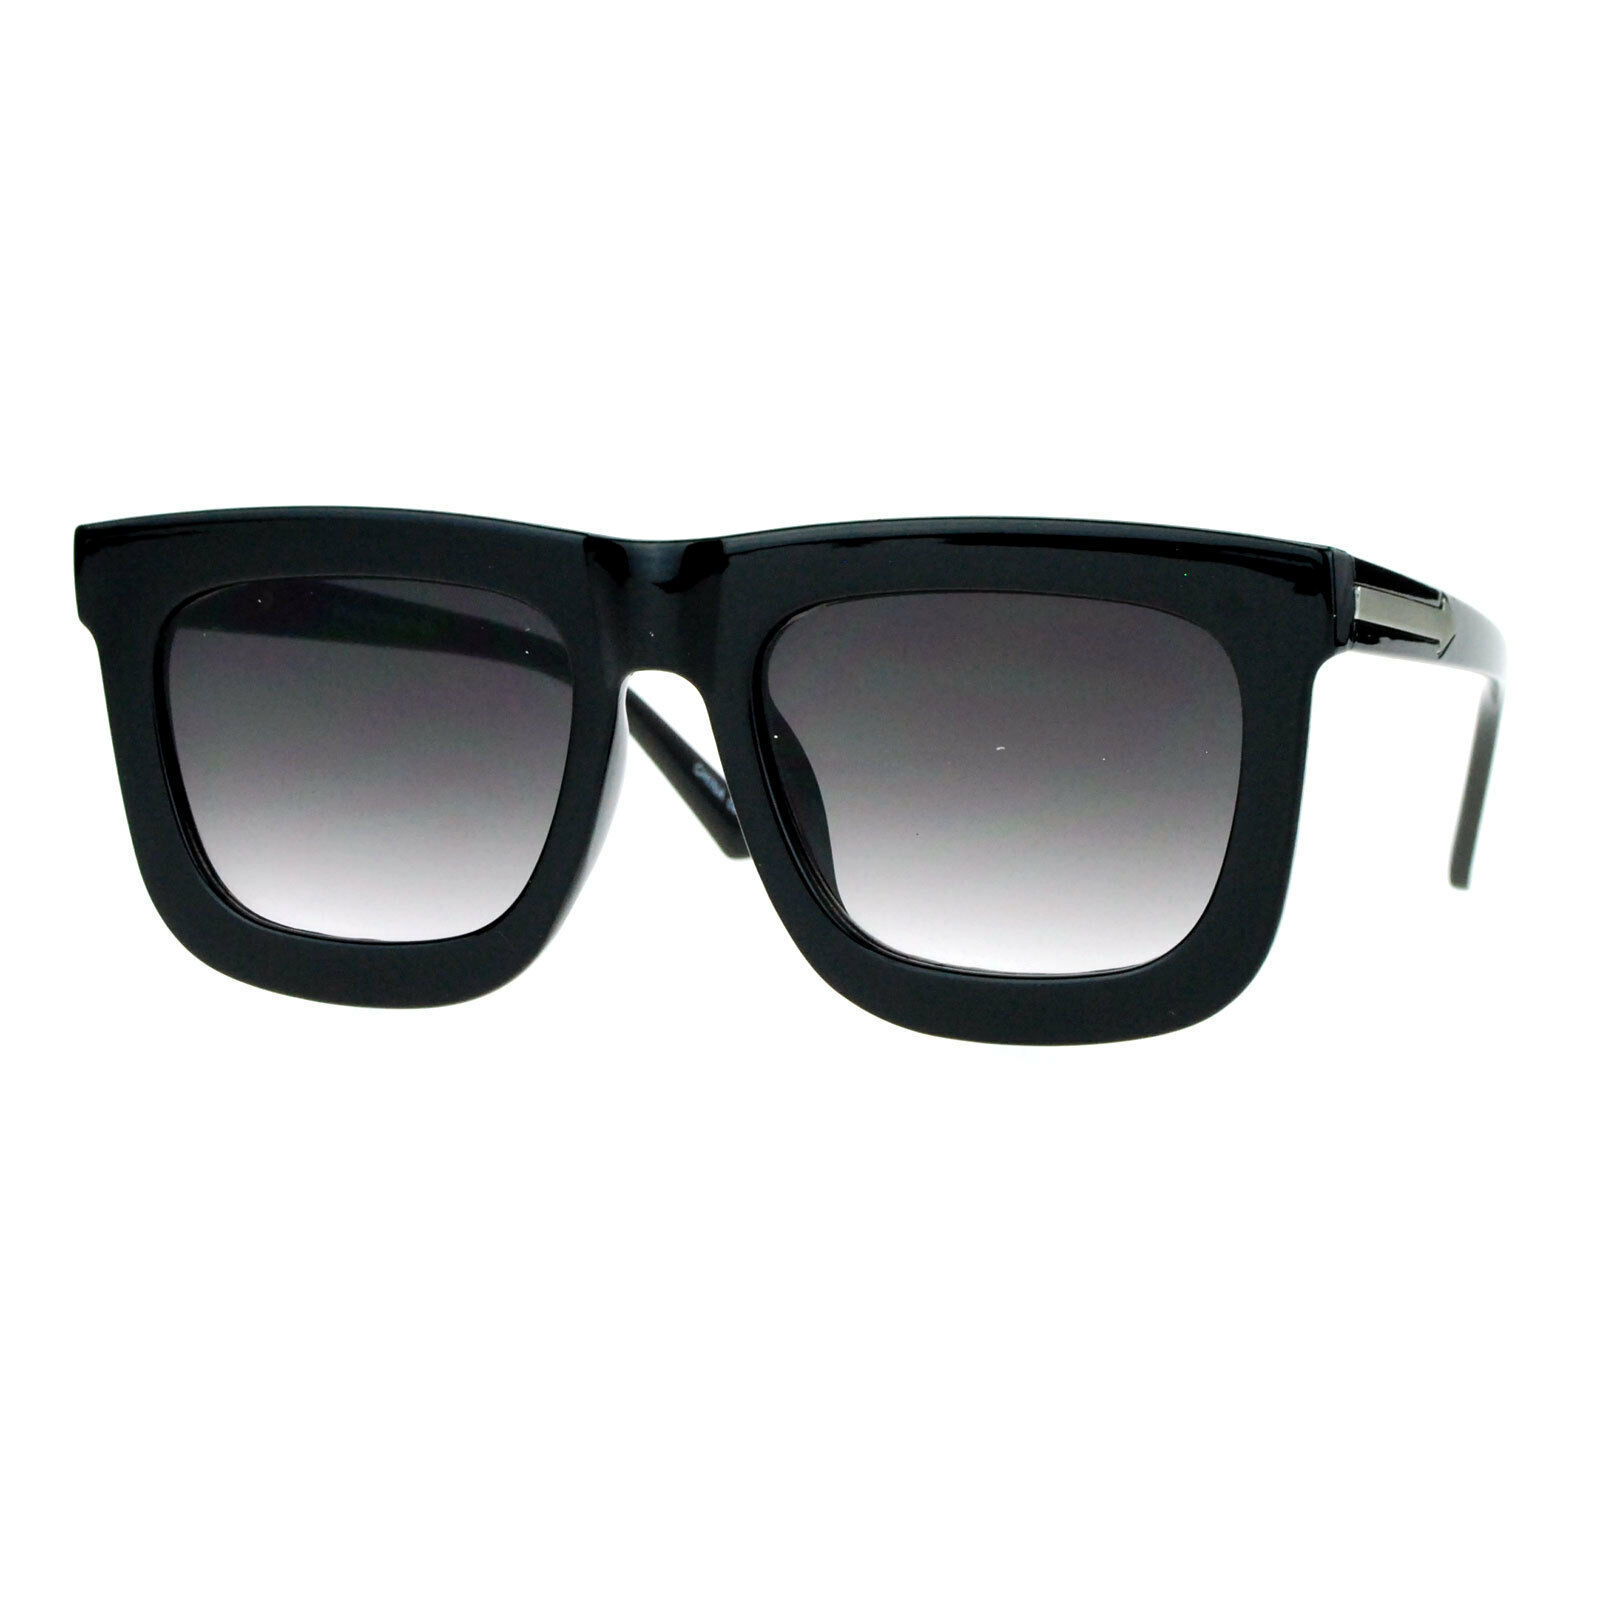 Super Flat Lens Sunglasses Arrow Design Oversized Square Frame New Hot